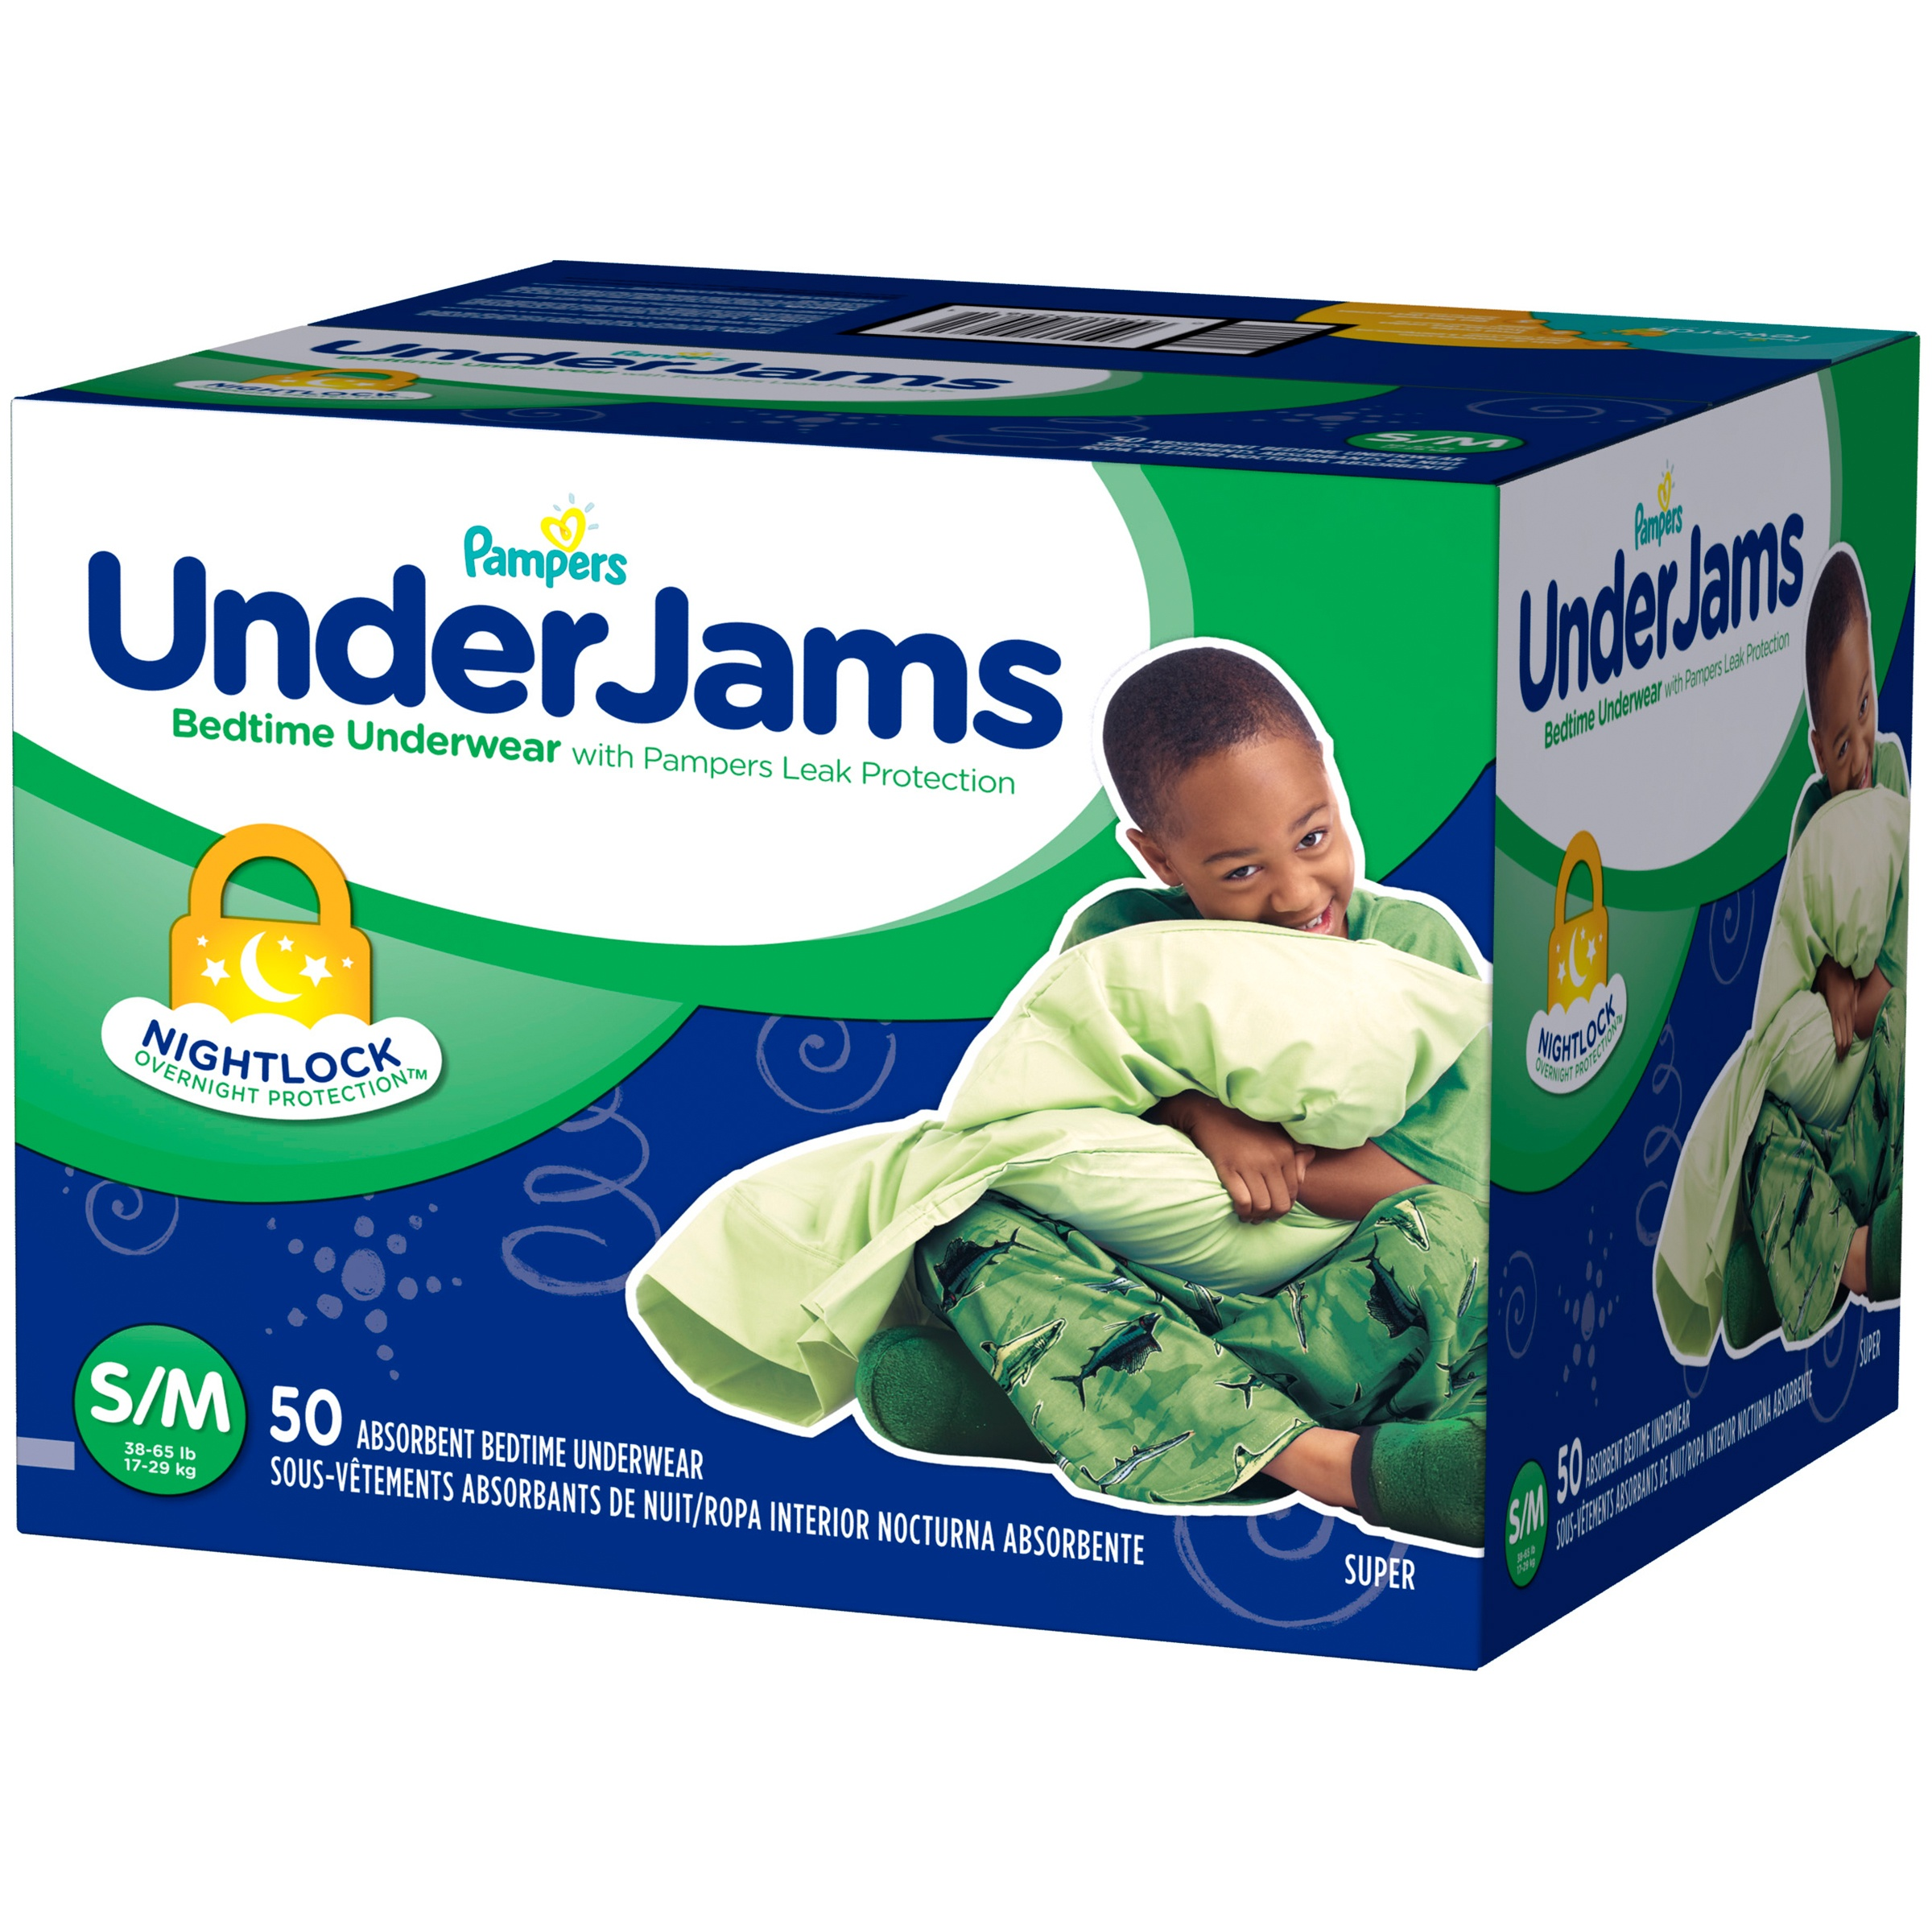 P&ers UnderJams Boysu0027 Bedtime Underwear (Choose Size and Count) - Walmart.com  sc 1 st  Walmart & Pampers UnderJams Boysu0027 Bedtime Underwear (Choose Size and Count ...